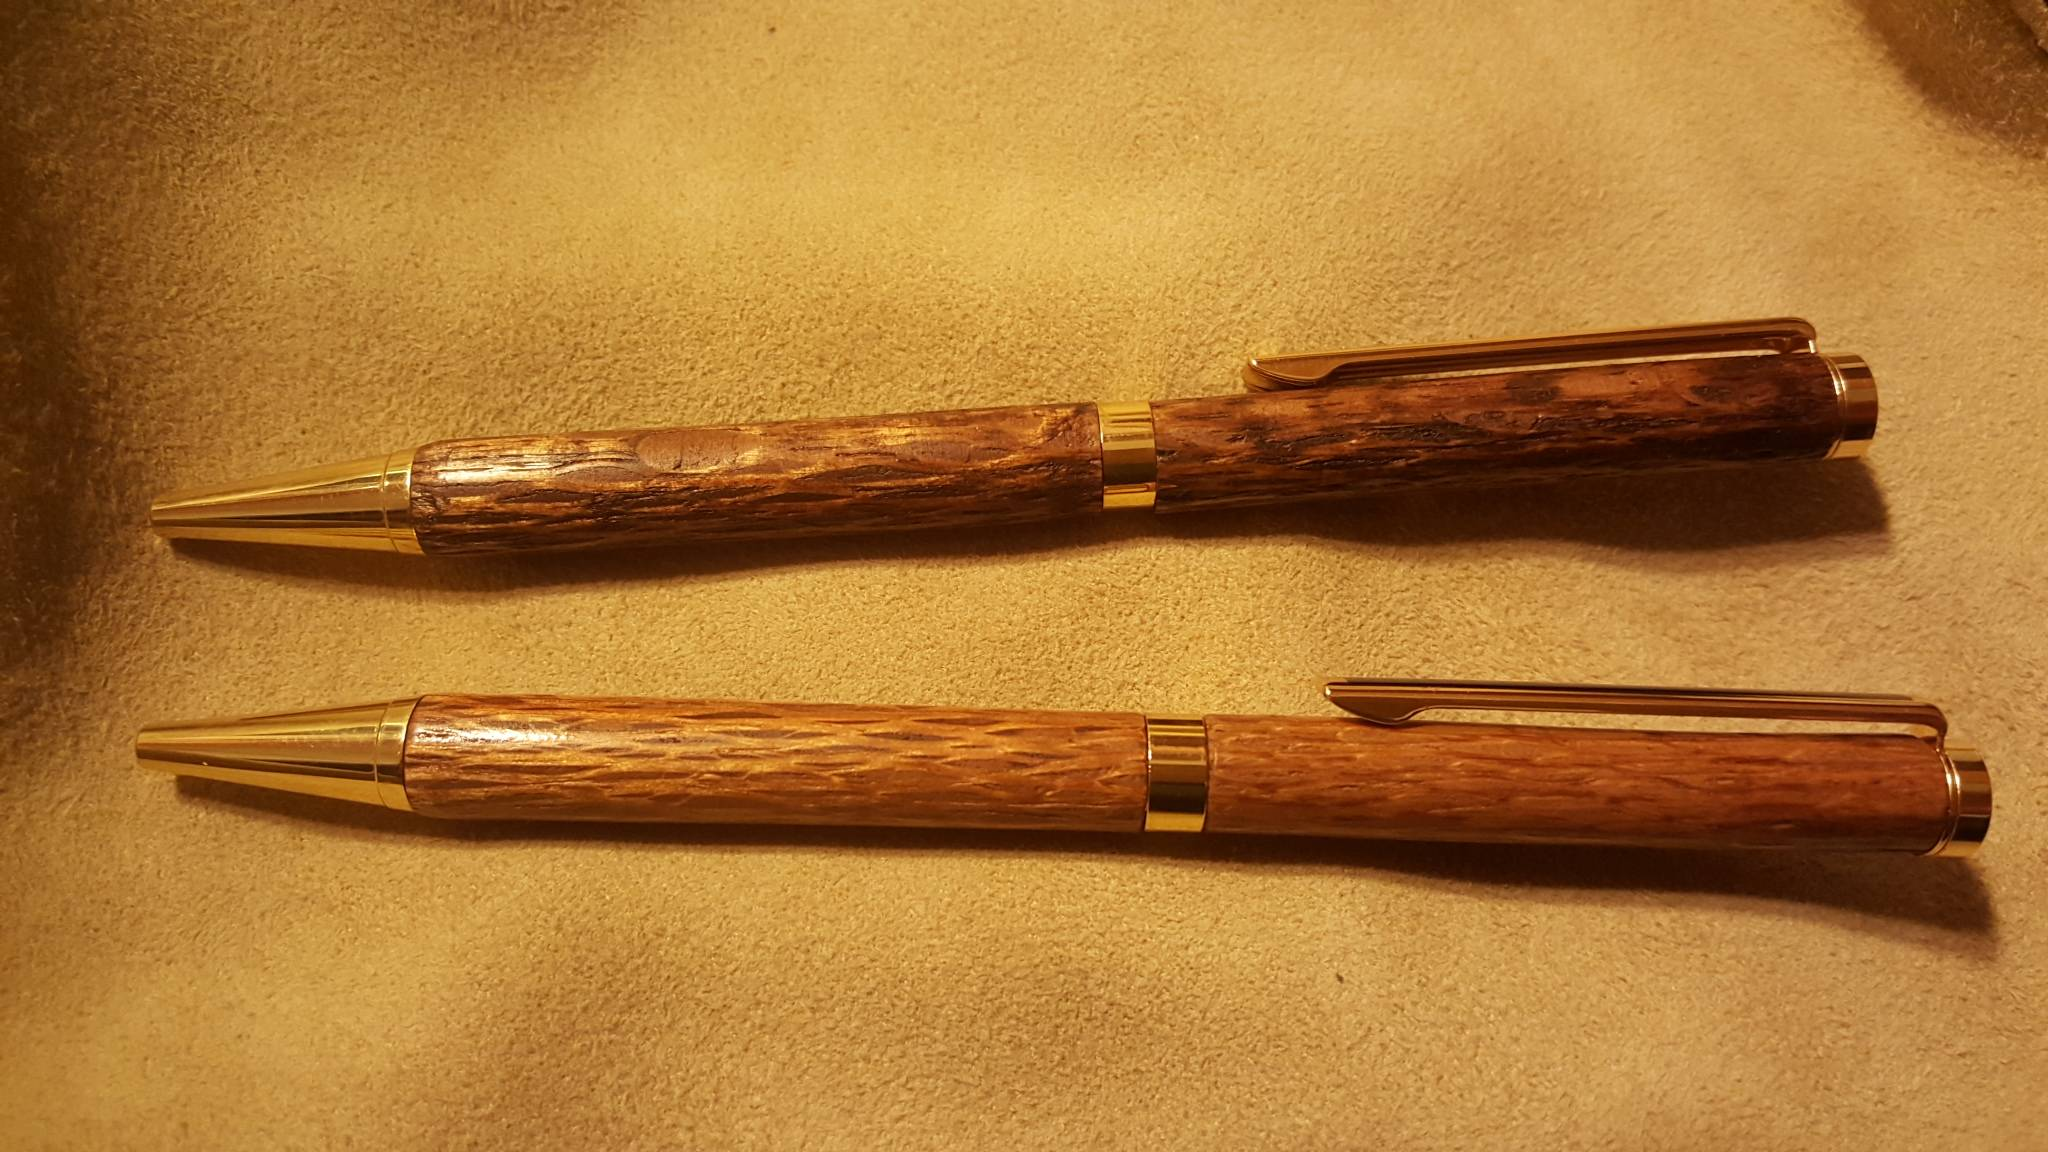 Lattice wood 'slimline' ballpoint pens